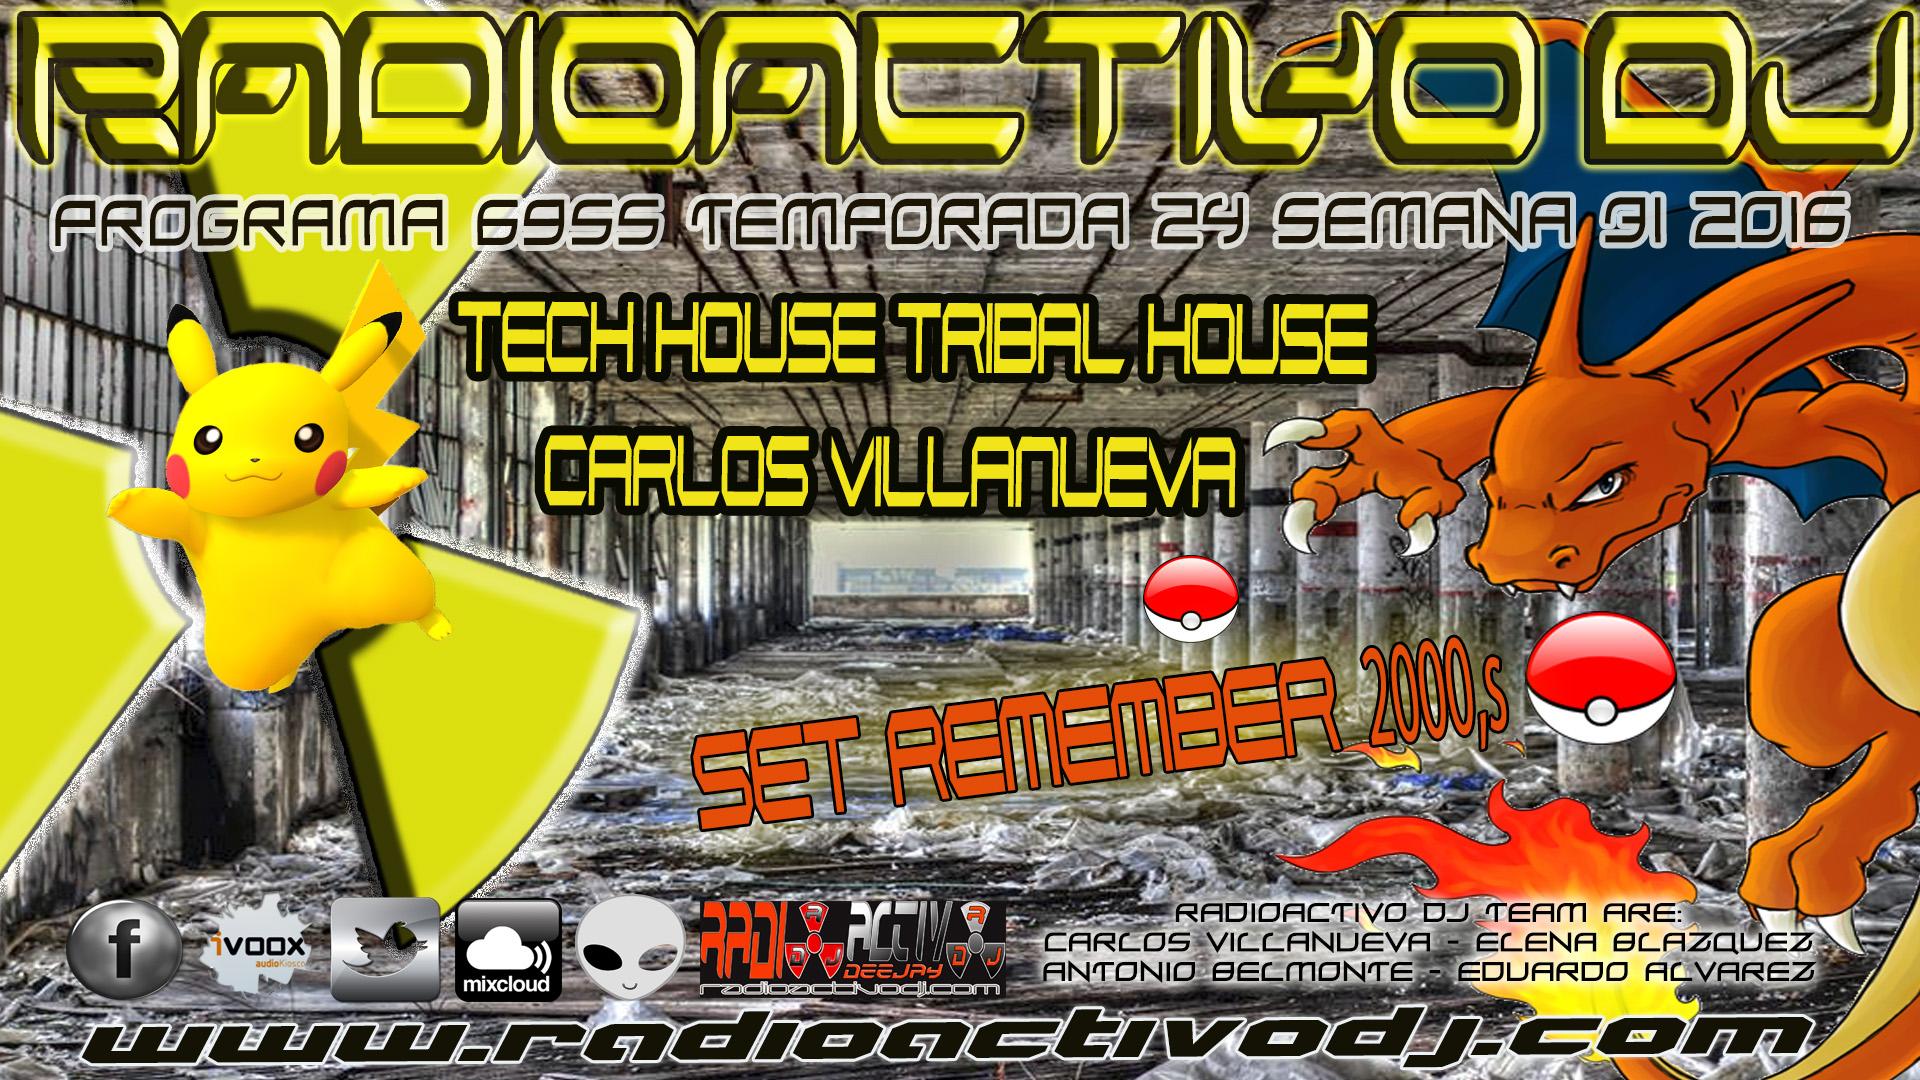 RADIOACTIVO-DJ-31-2016